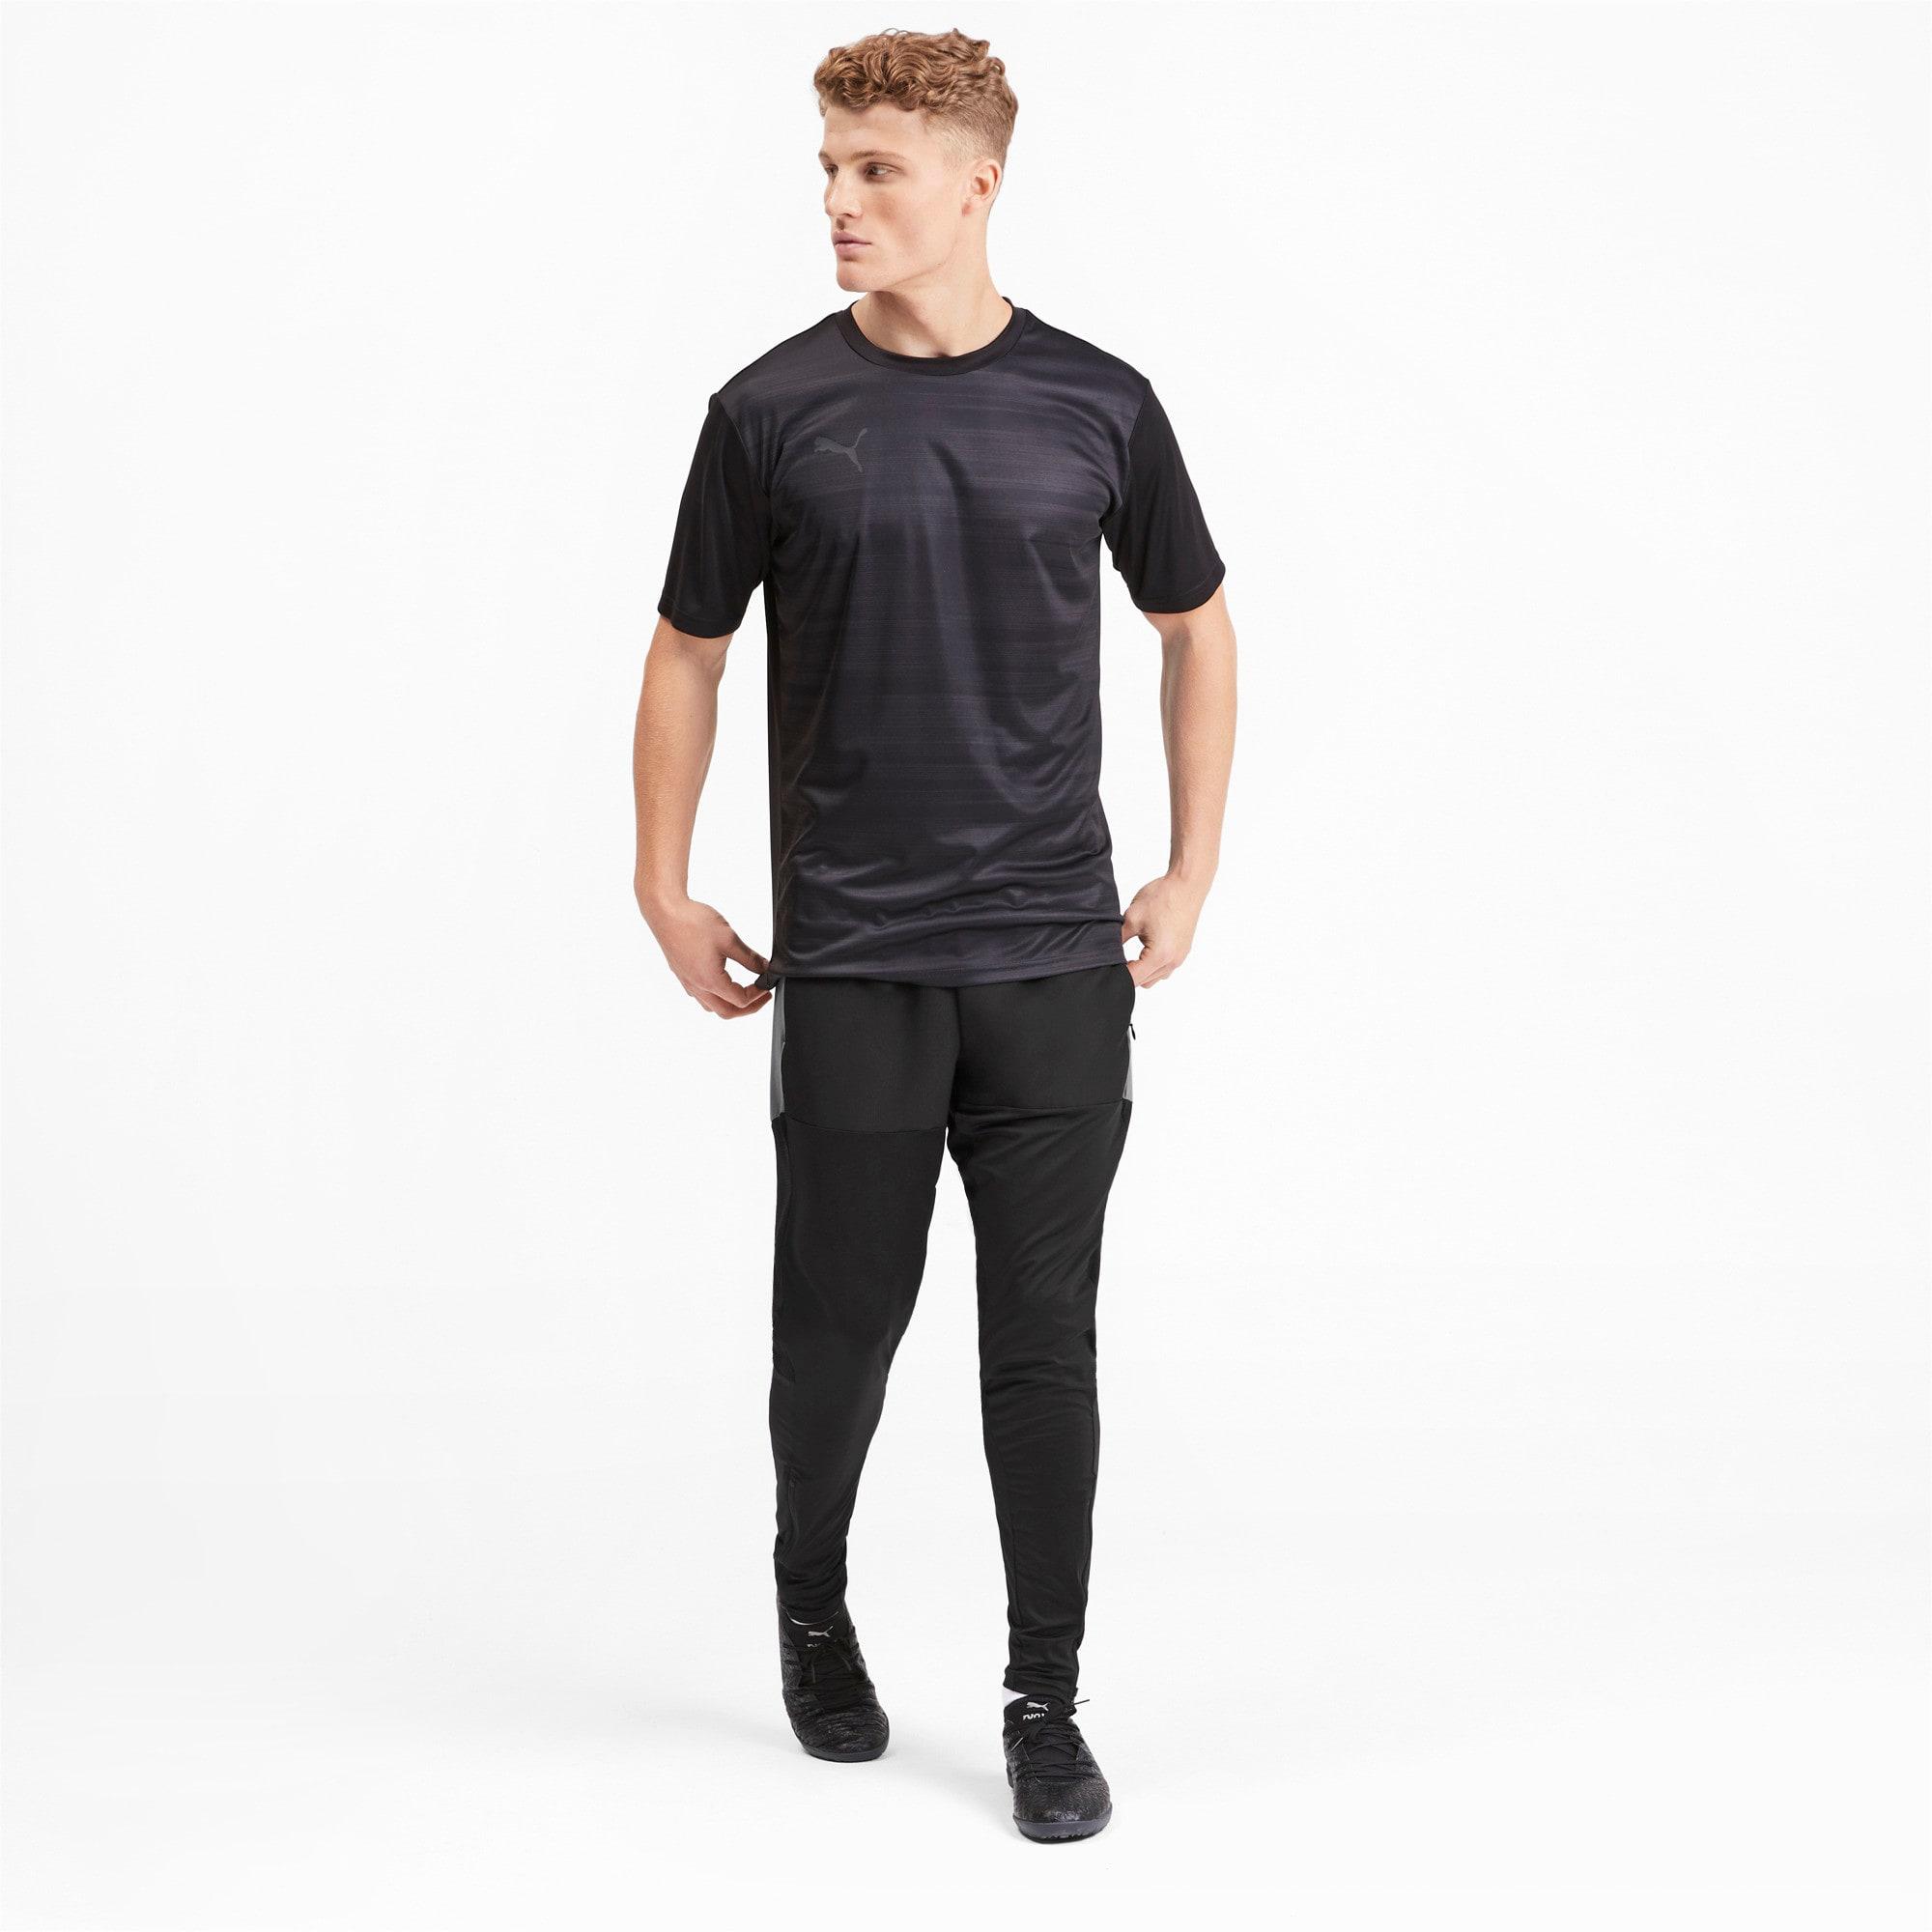 Thumbnail 3 of ftblNXT Men's Pro Pants, Puma Black-Nrgy Red, medium